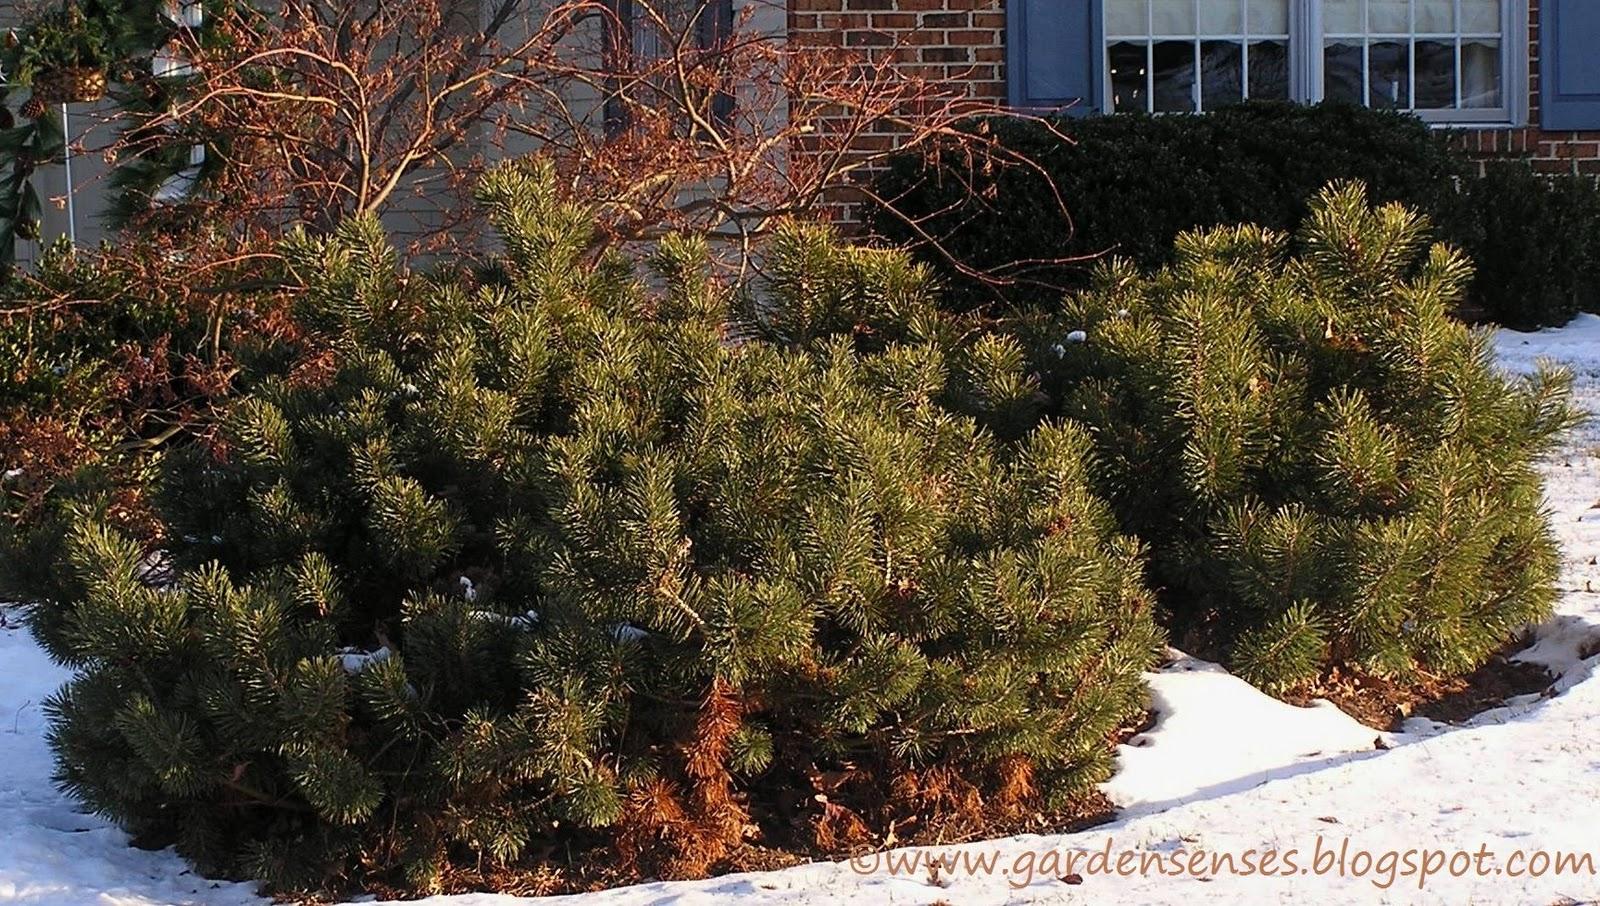 Garden sense evergreen shrubs for Tall evergreen shrubs